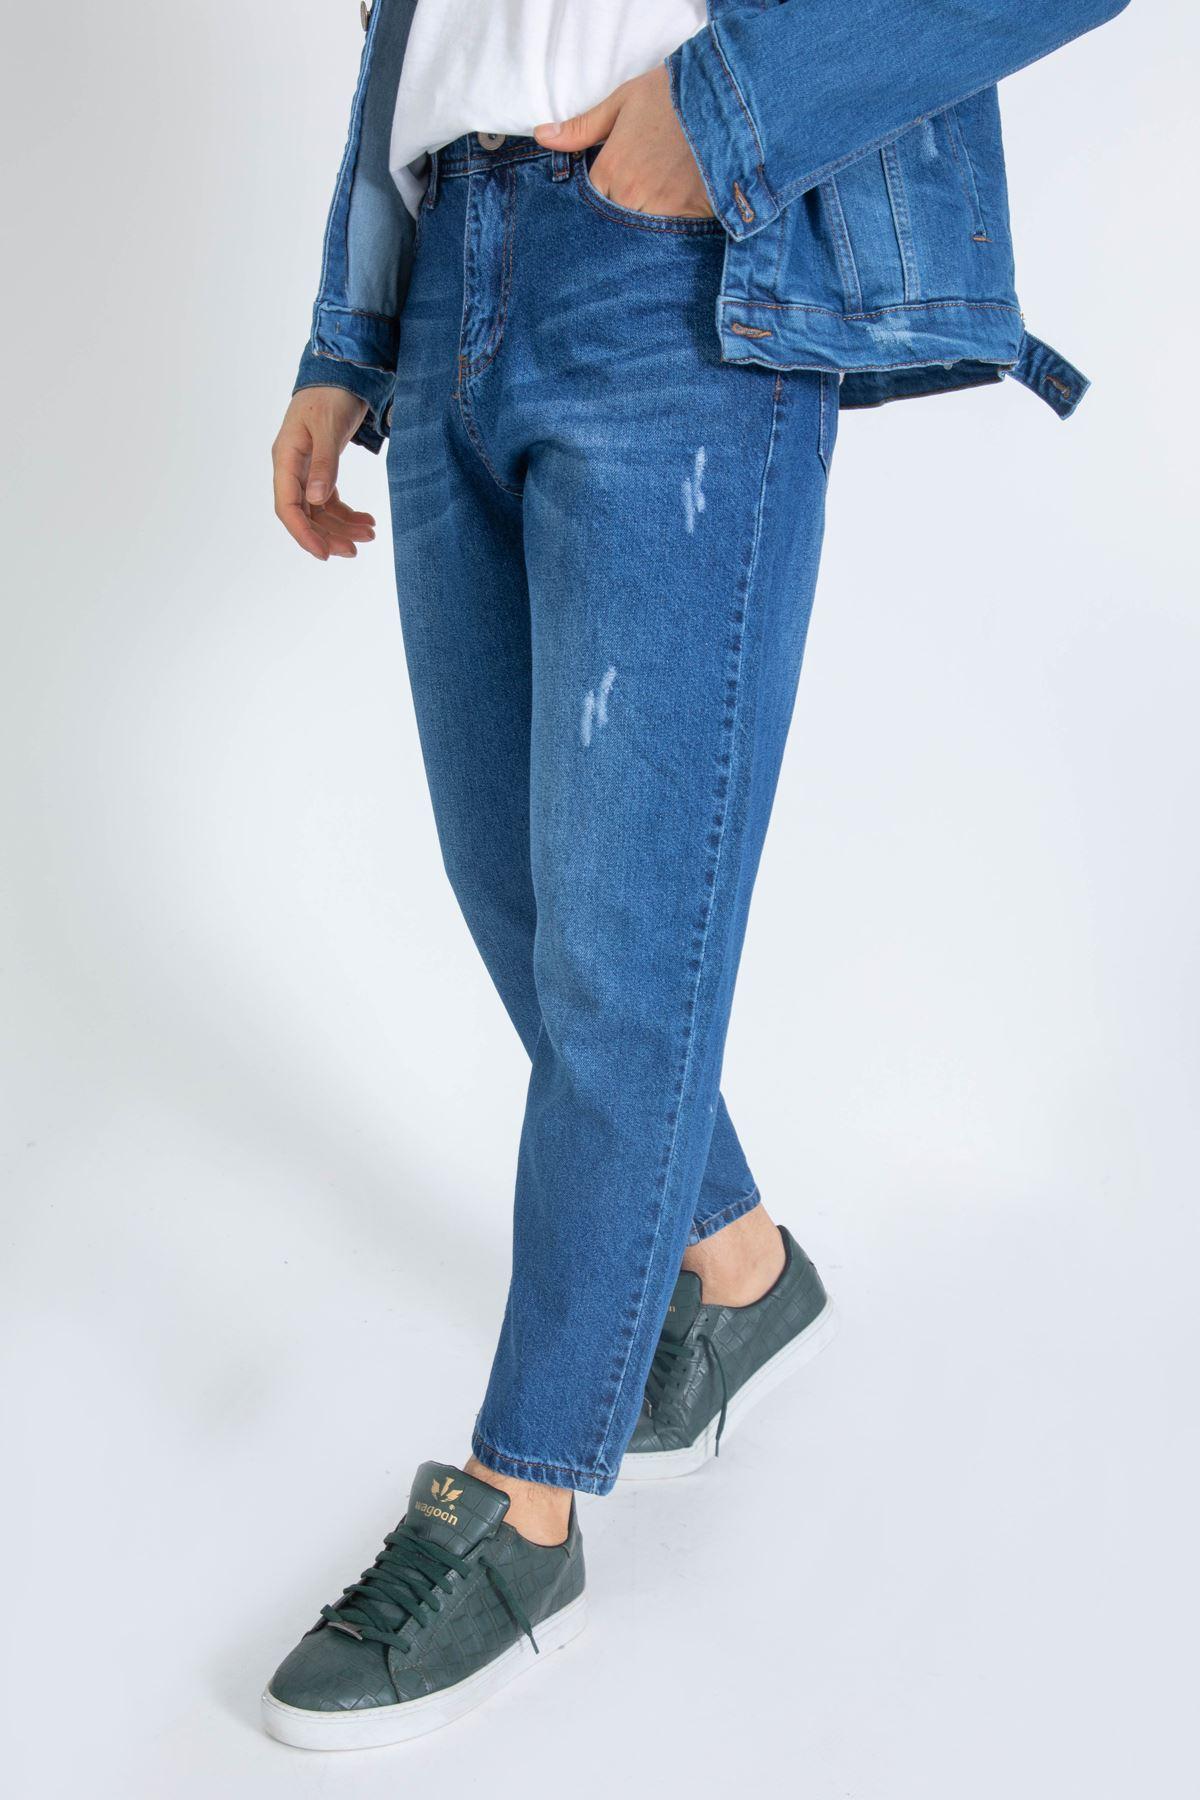 Erkek Lazer Tırnaklı Boyfriend Açık Mavi Kot Pantolon